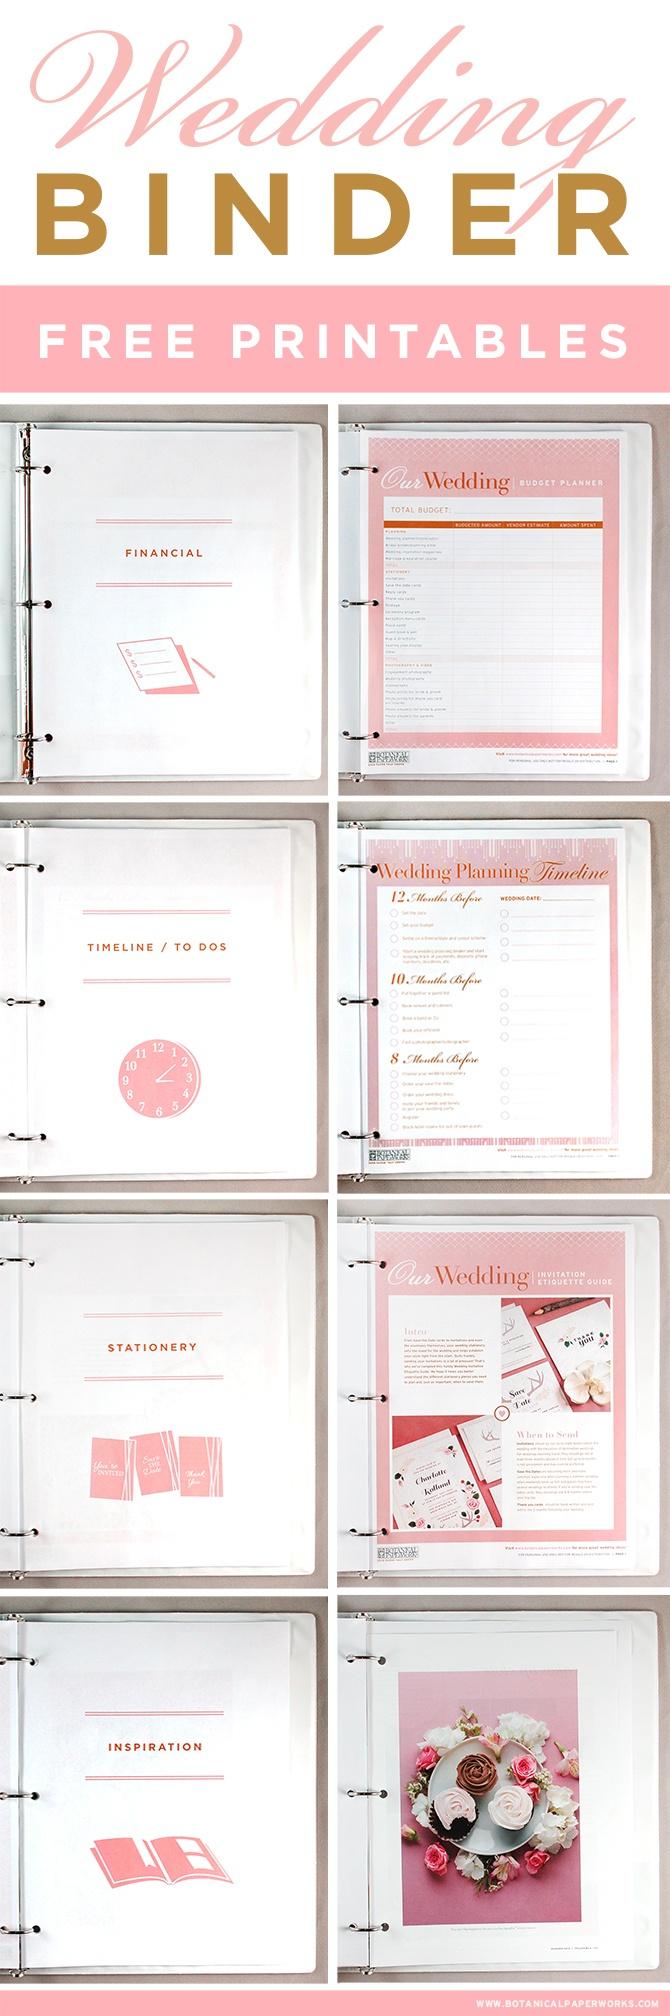 Free Printables} Wedding Planning Binder | Blog | Botanical Paperworks - Free Printable Wedding Binder Templates